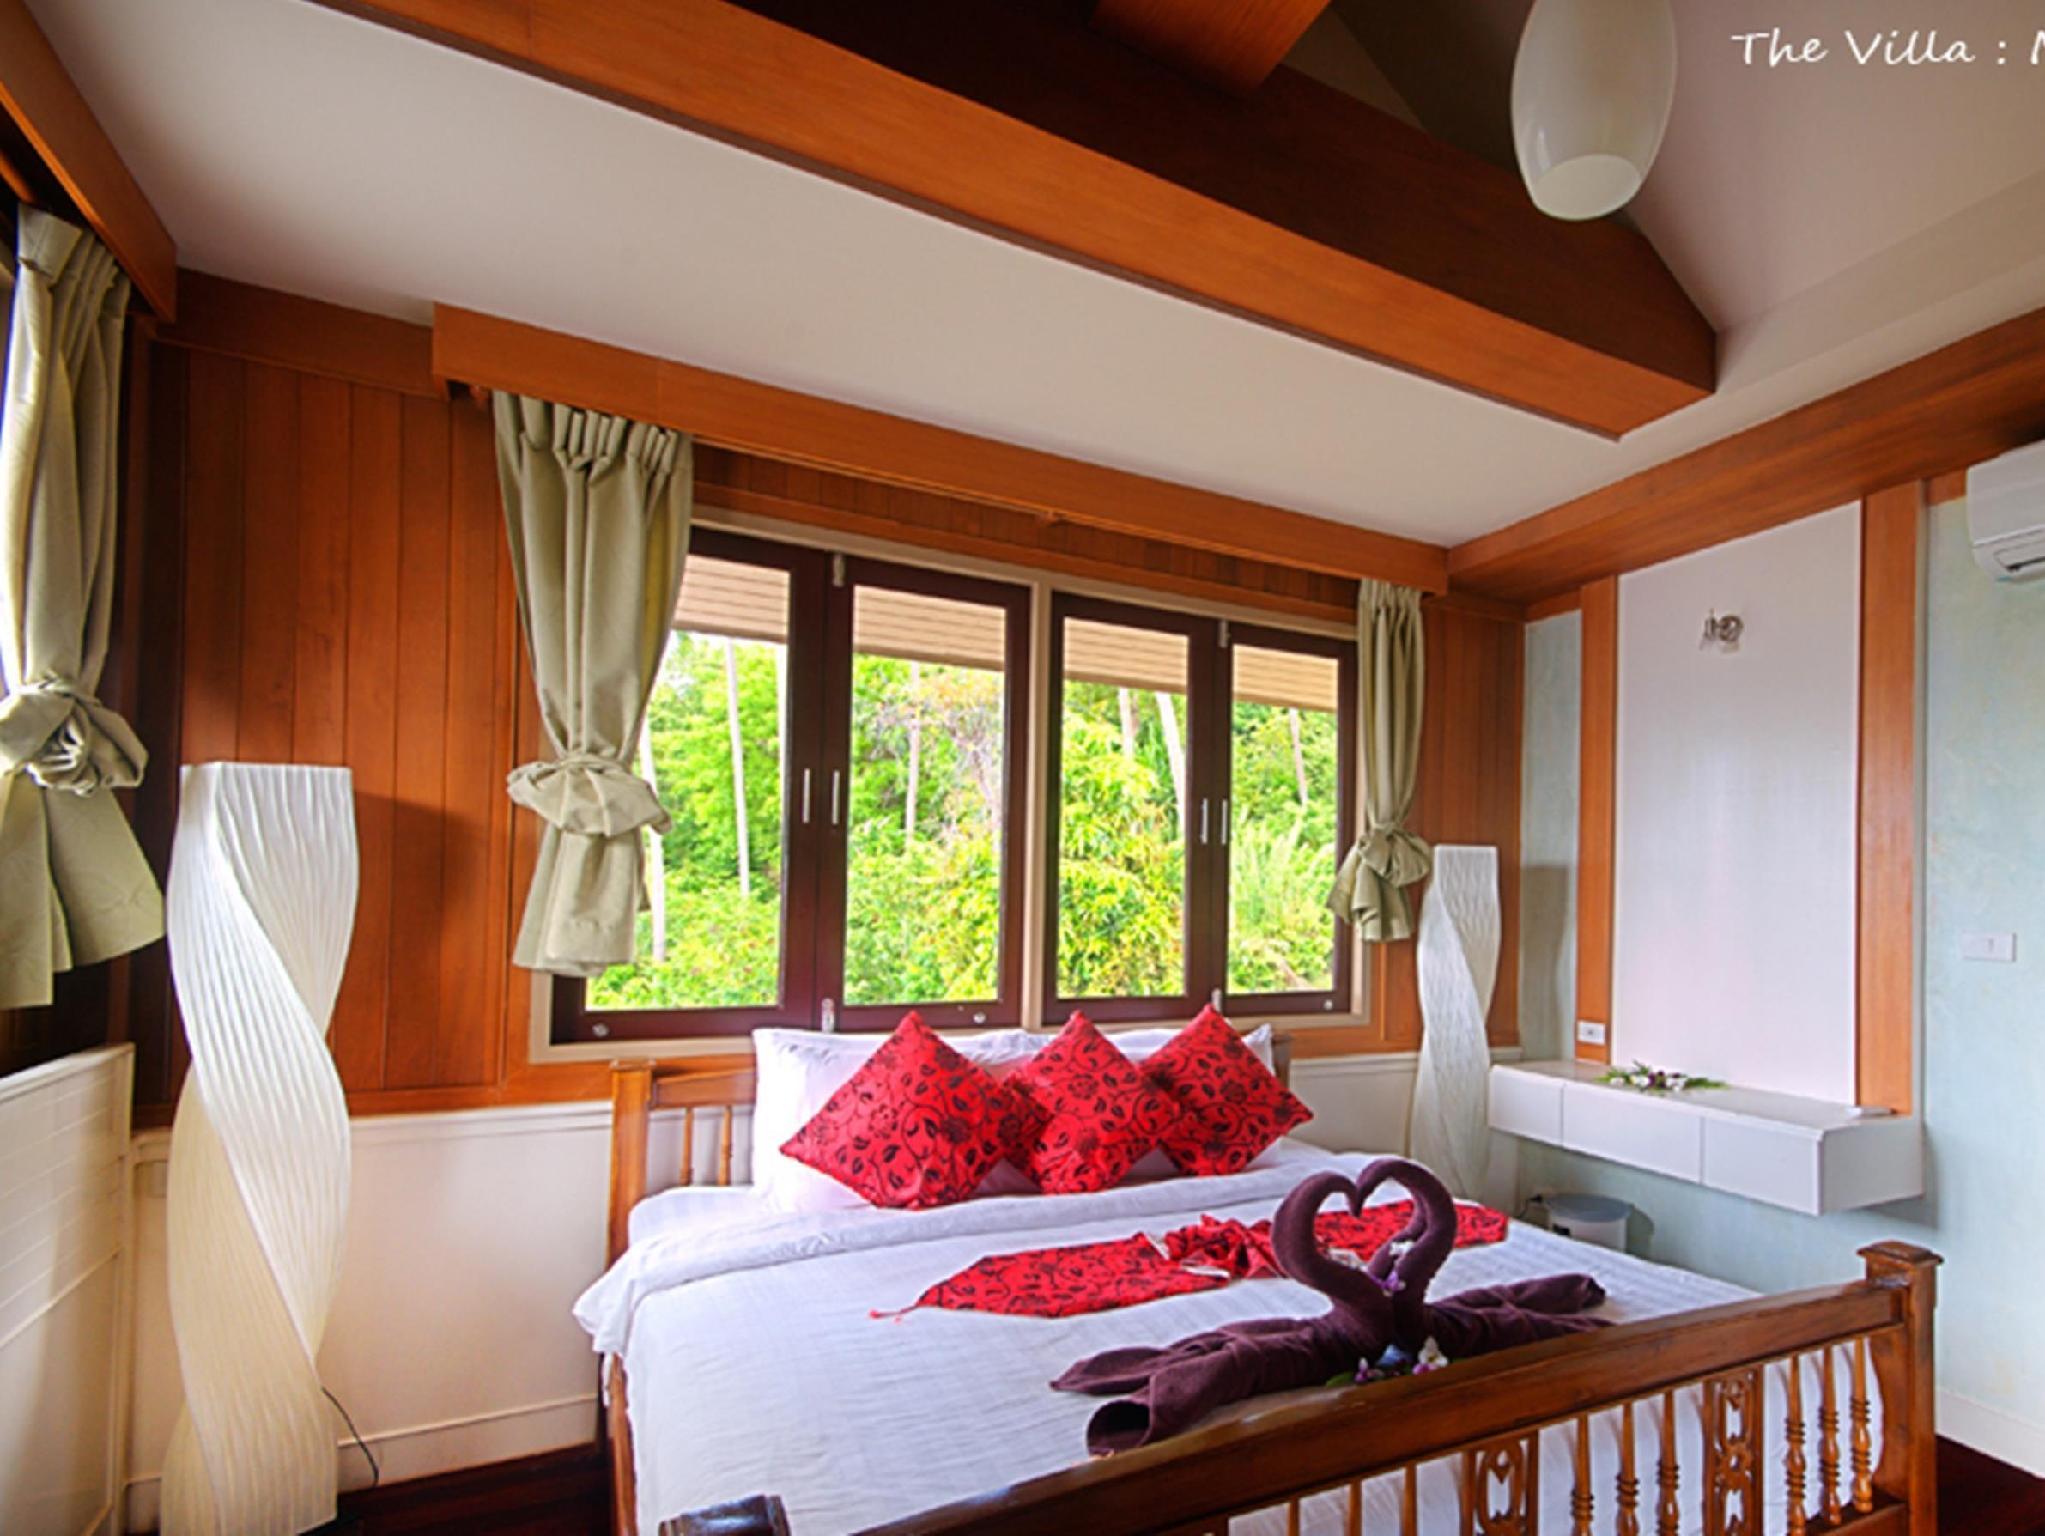 The Villa Hacienda21